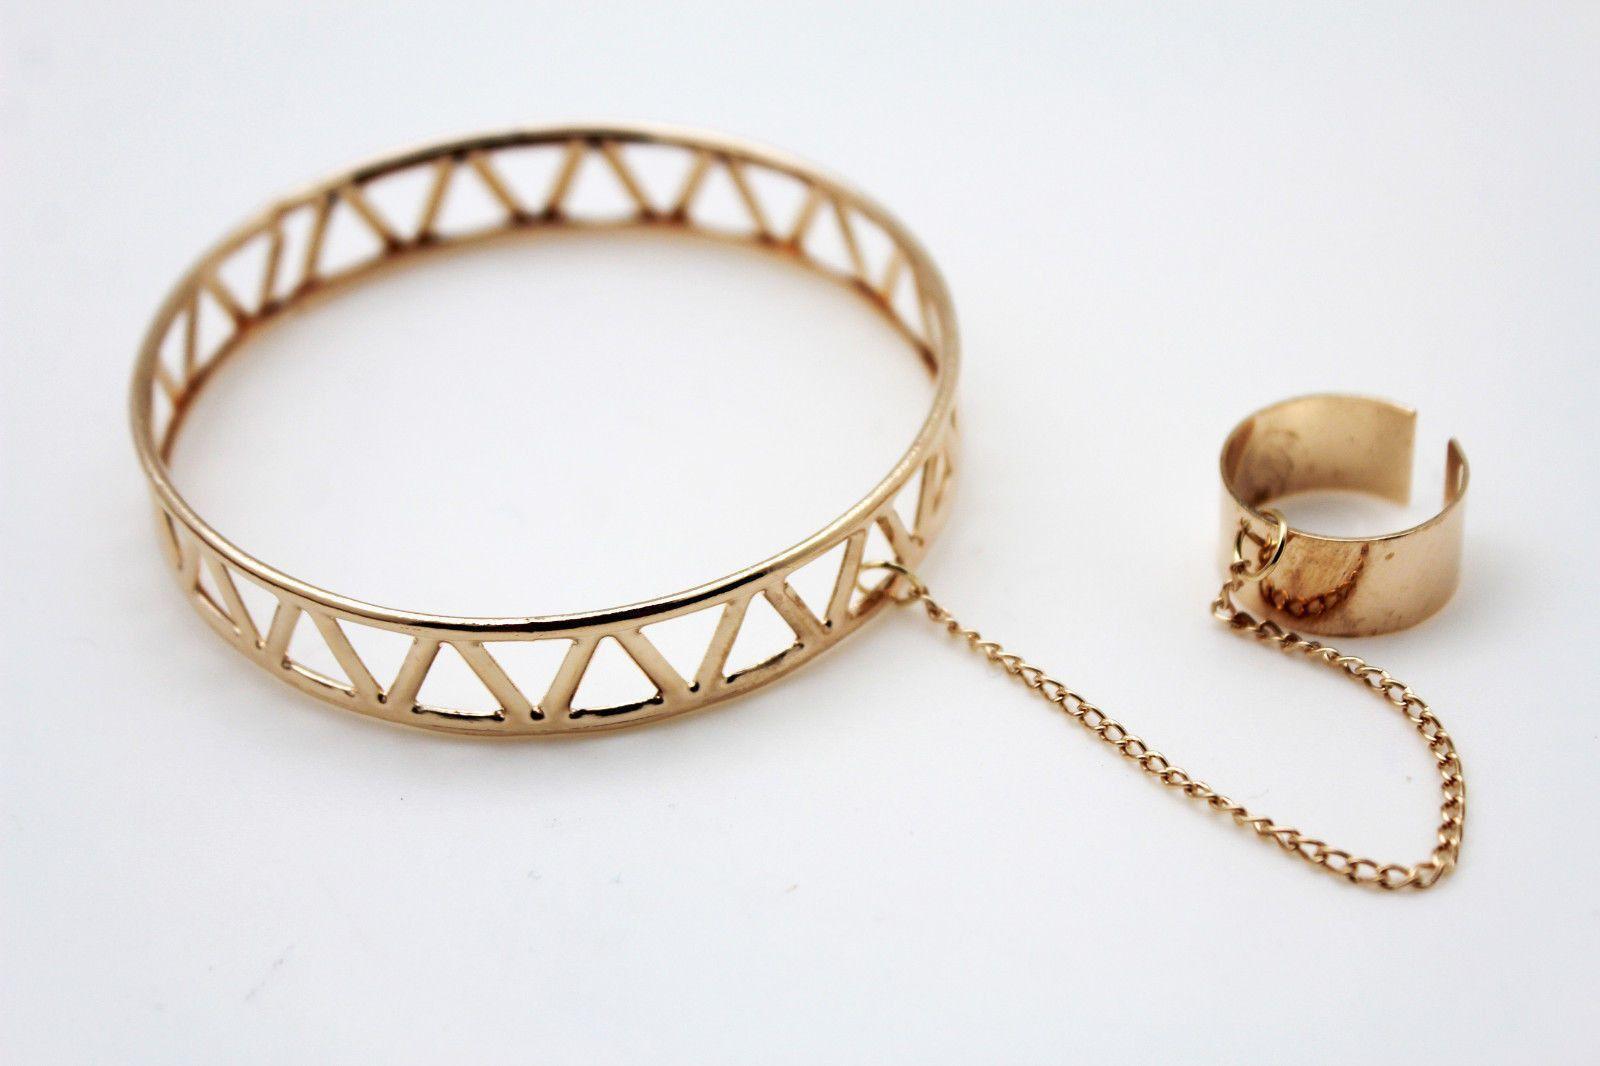 Silver gold metal hand chain slave ring wrist bracelet narrow